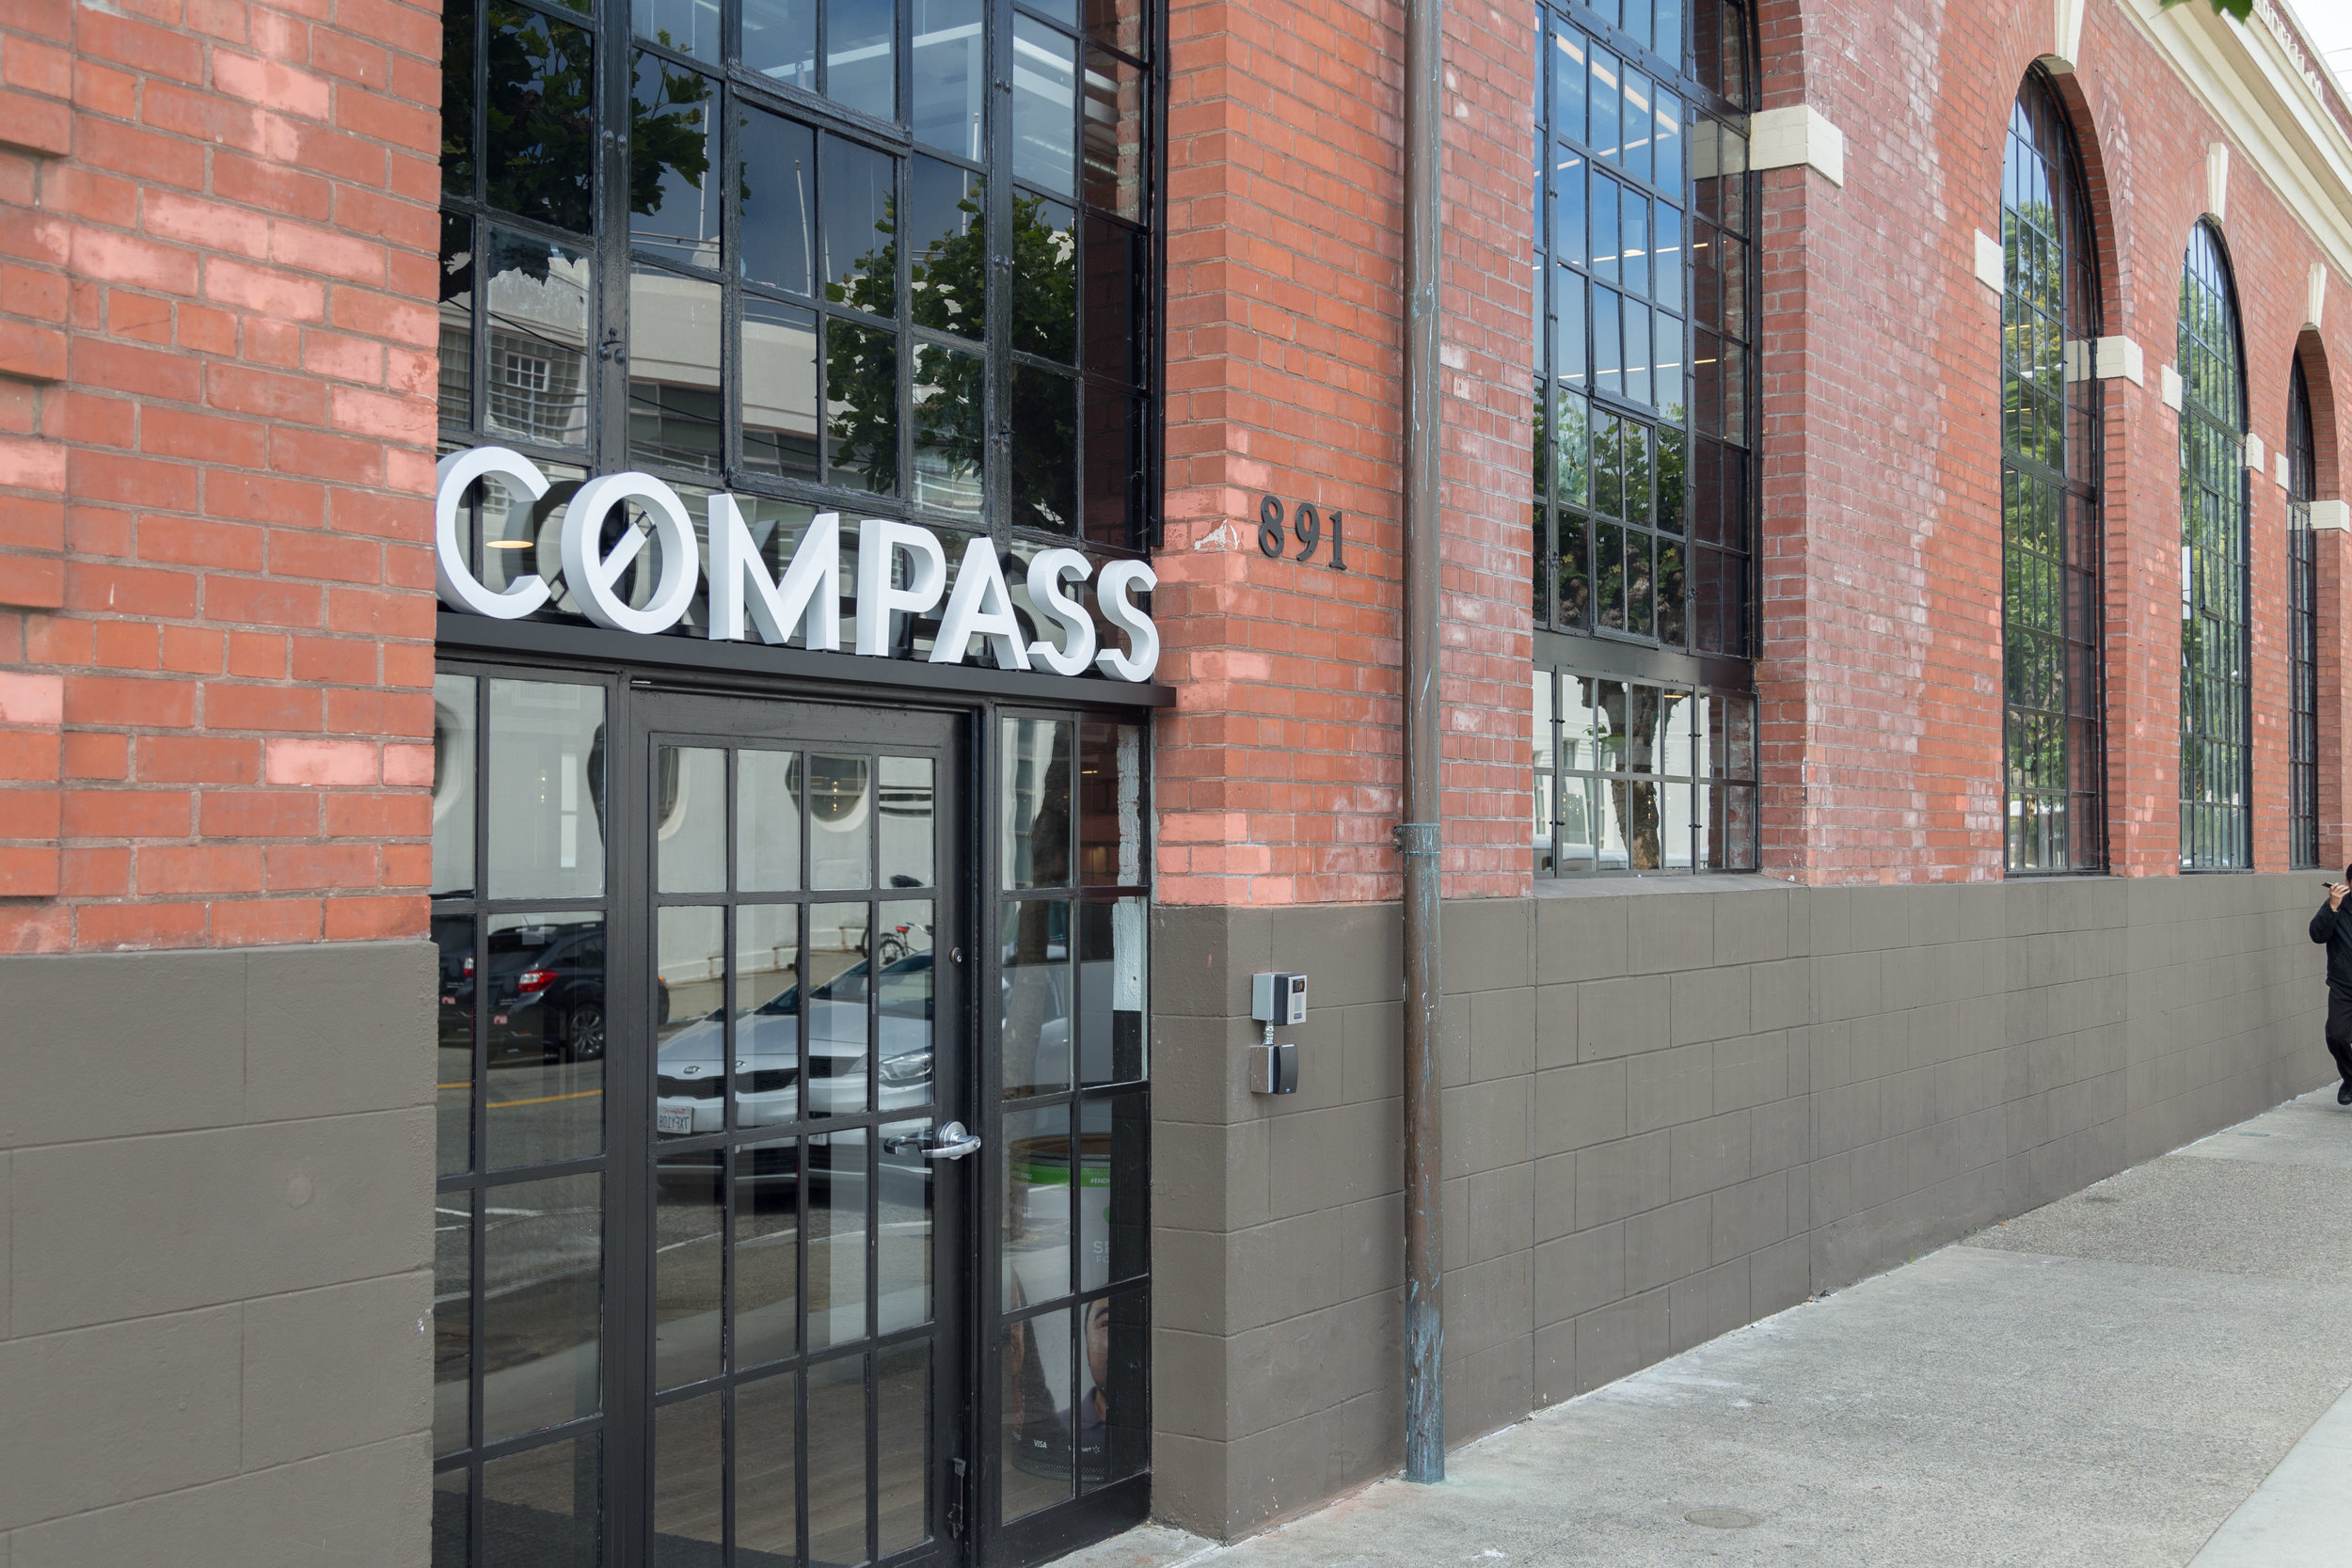 Compass San Francisco - 891 Beach Street, San Francisco, CA